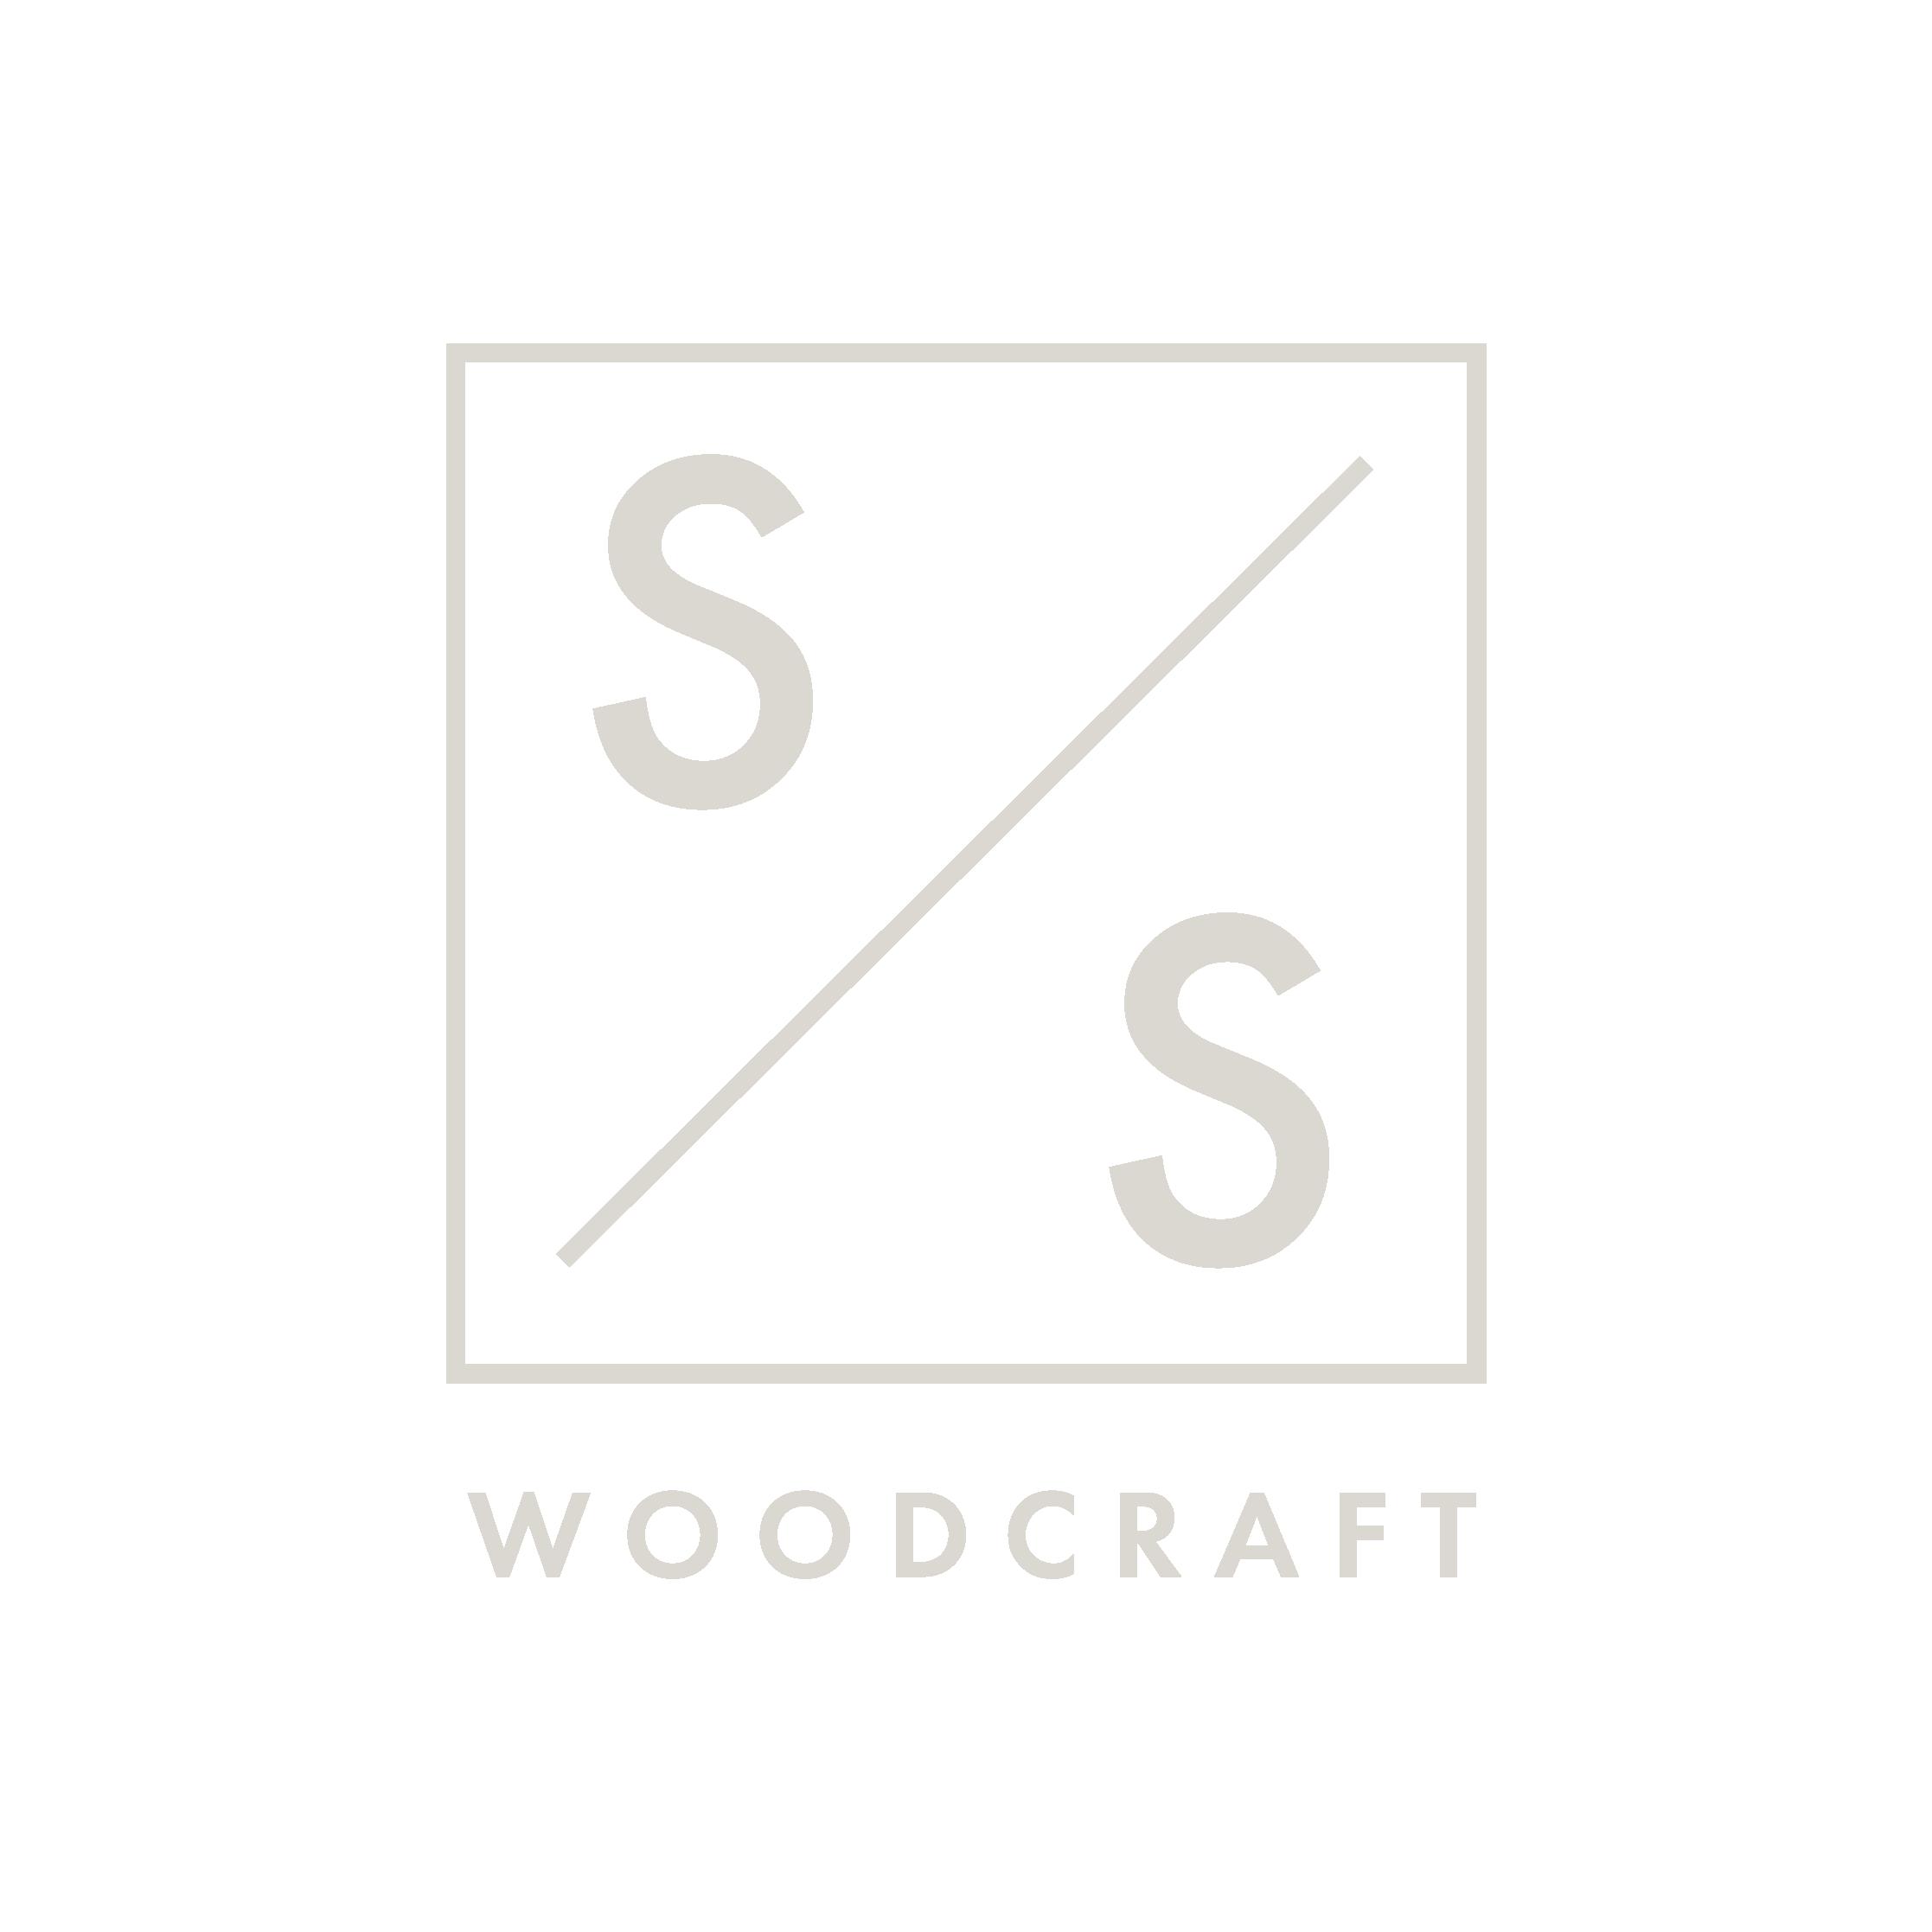 S&S Woodcraft logo ash